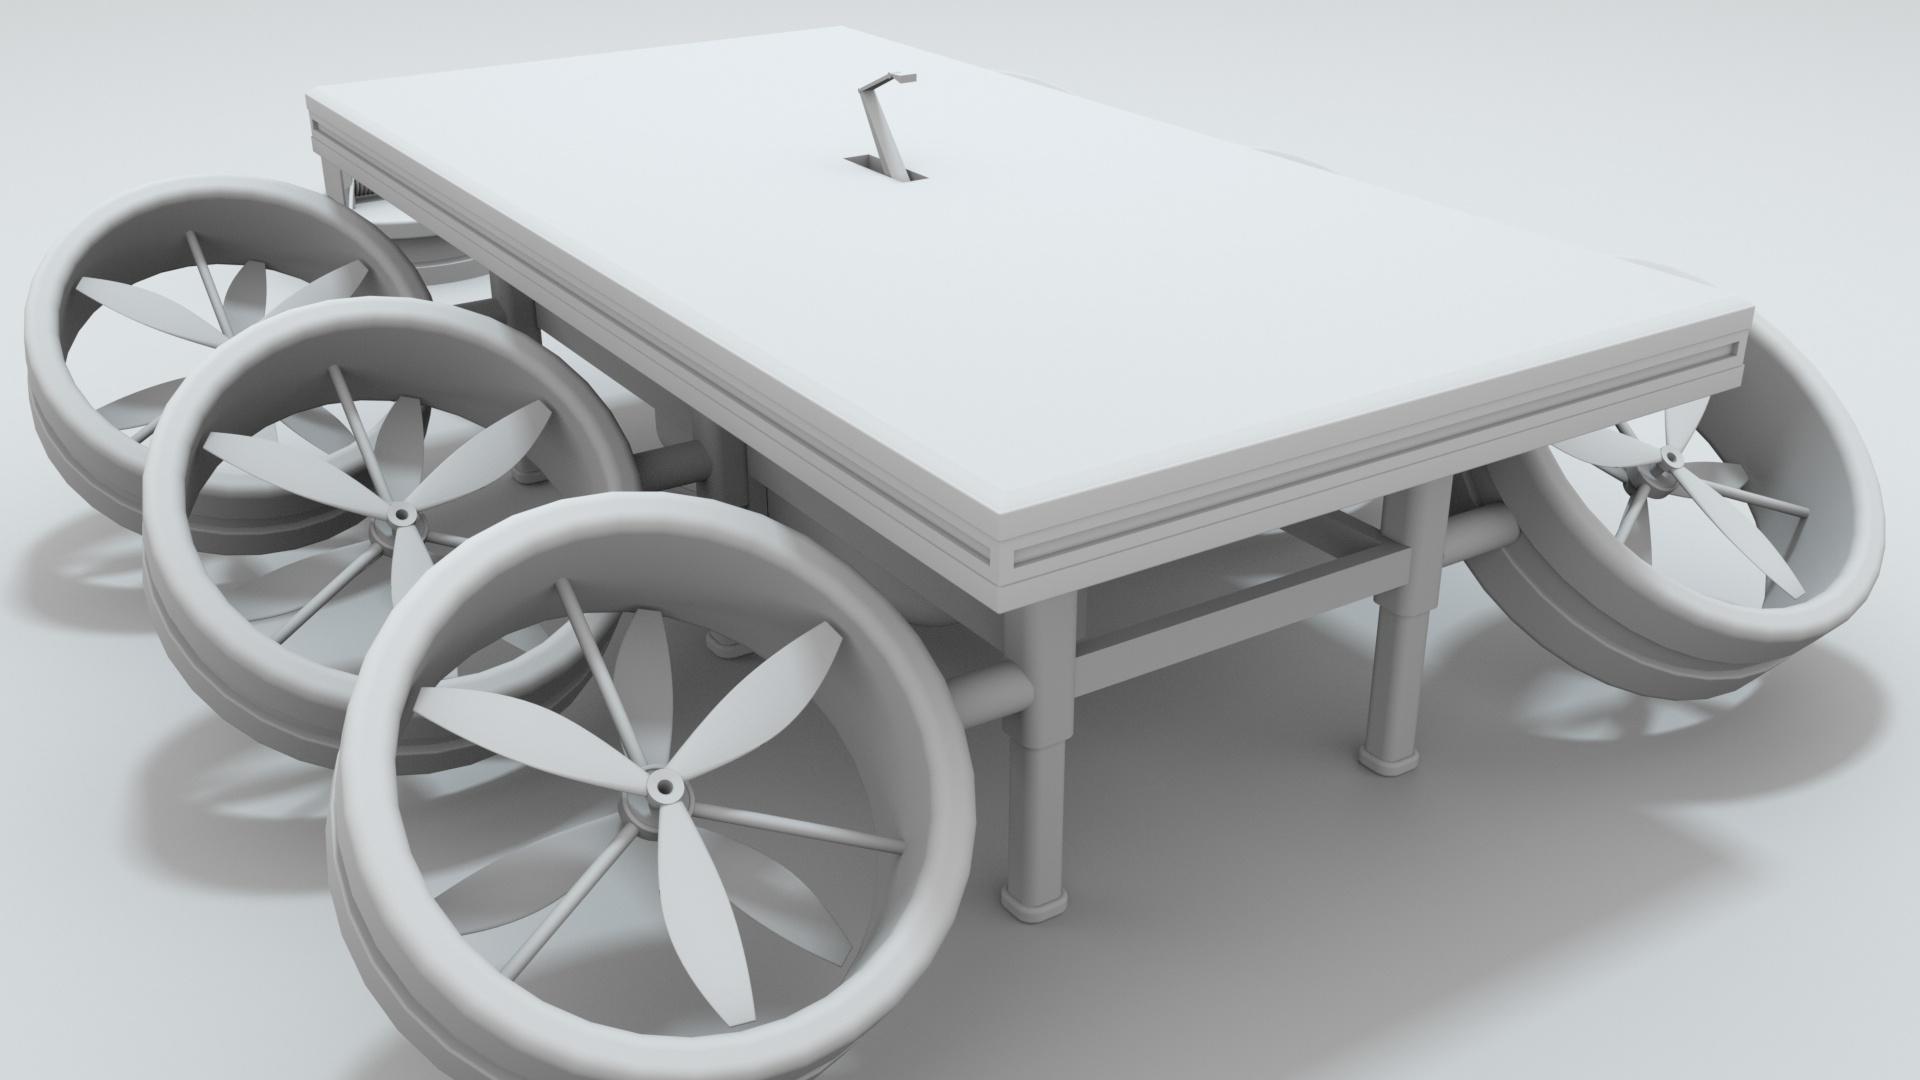 plateforme drone - wip asbridge 4